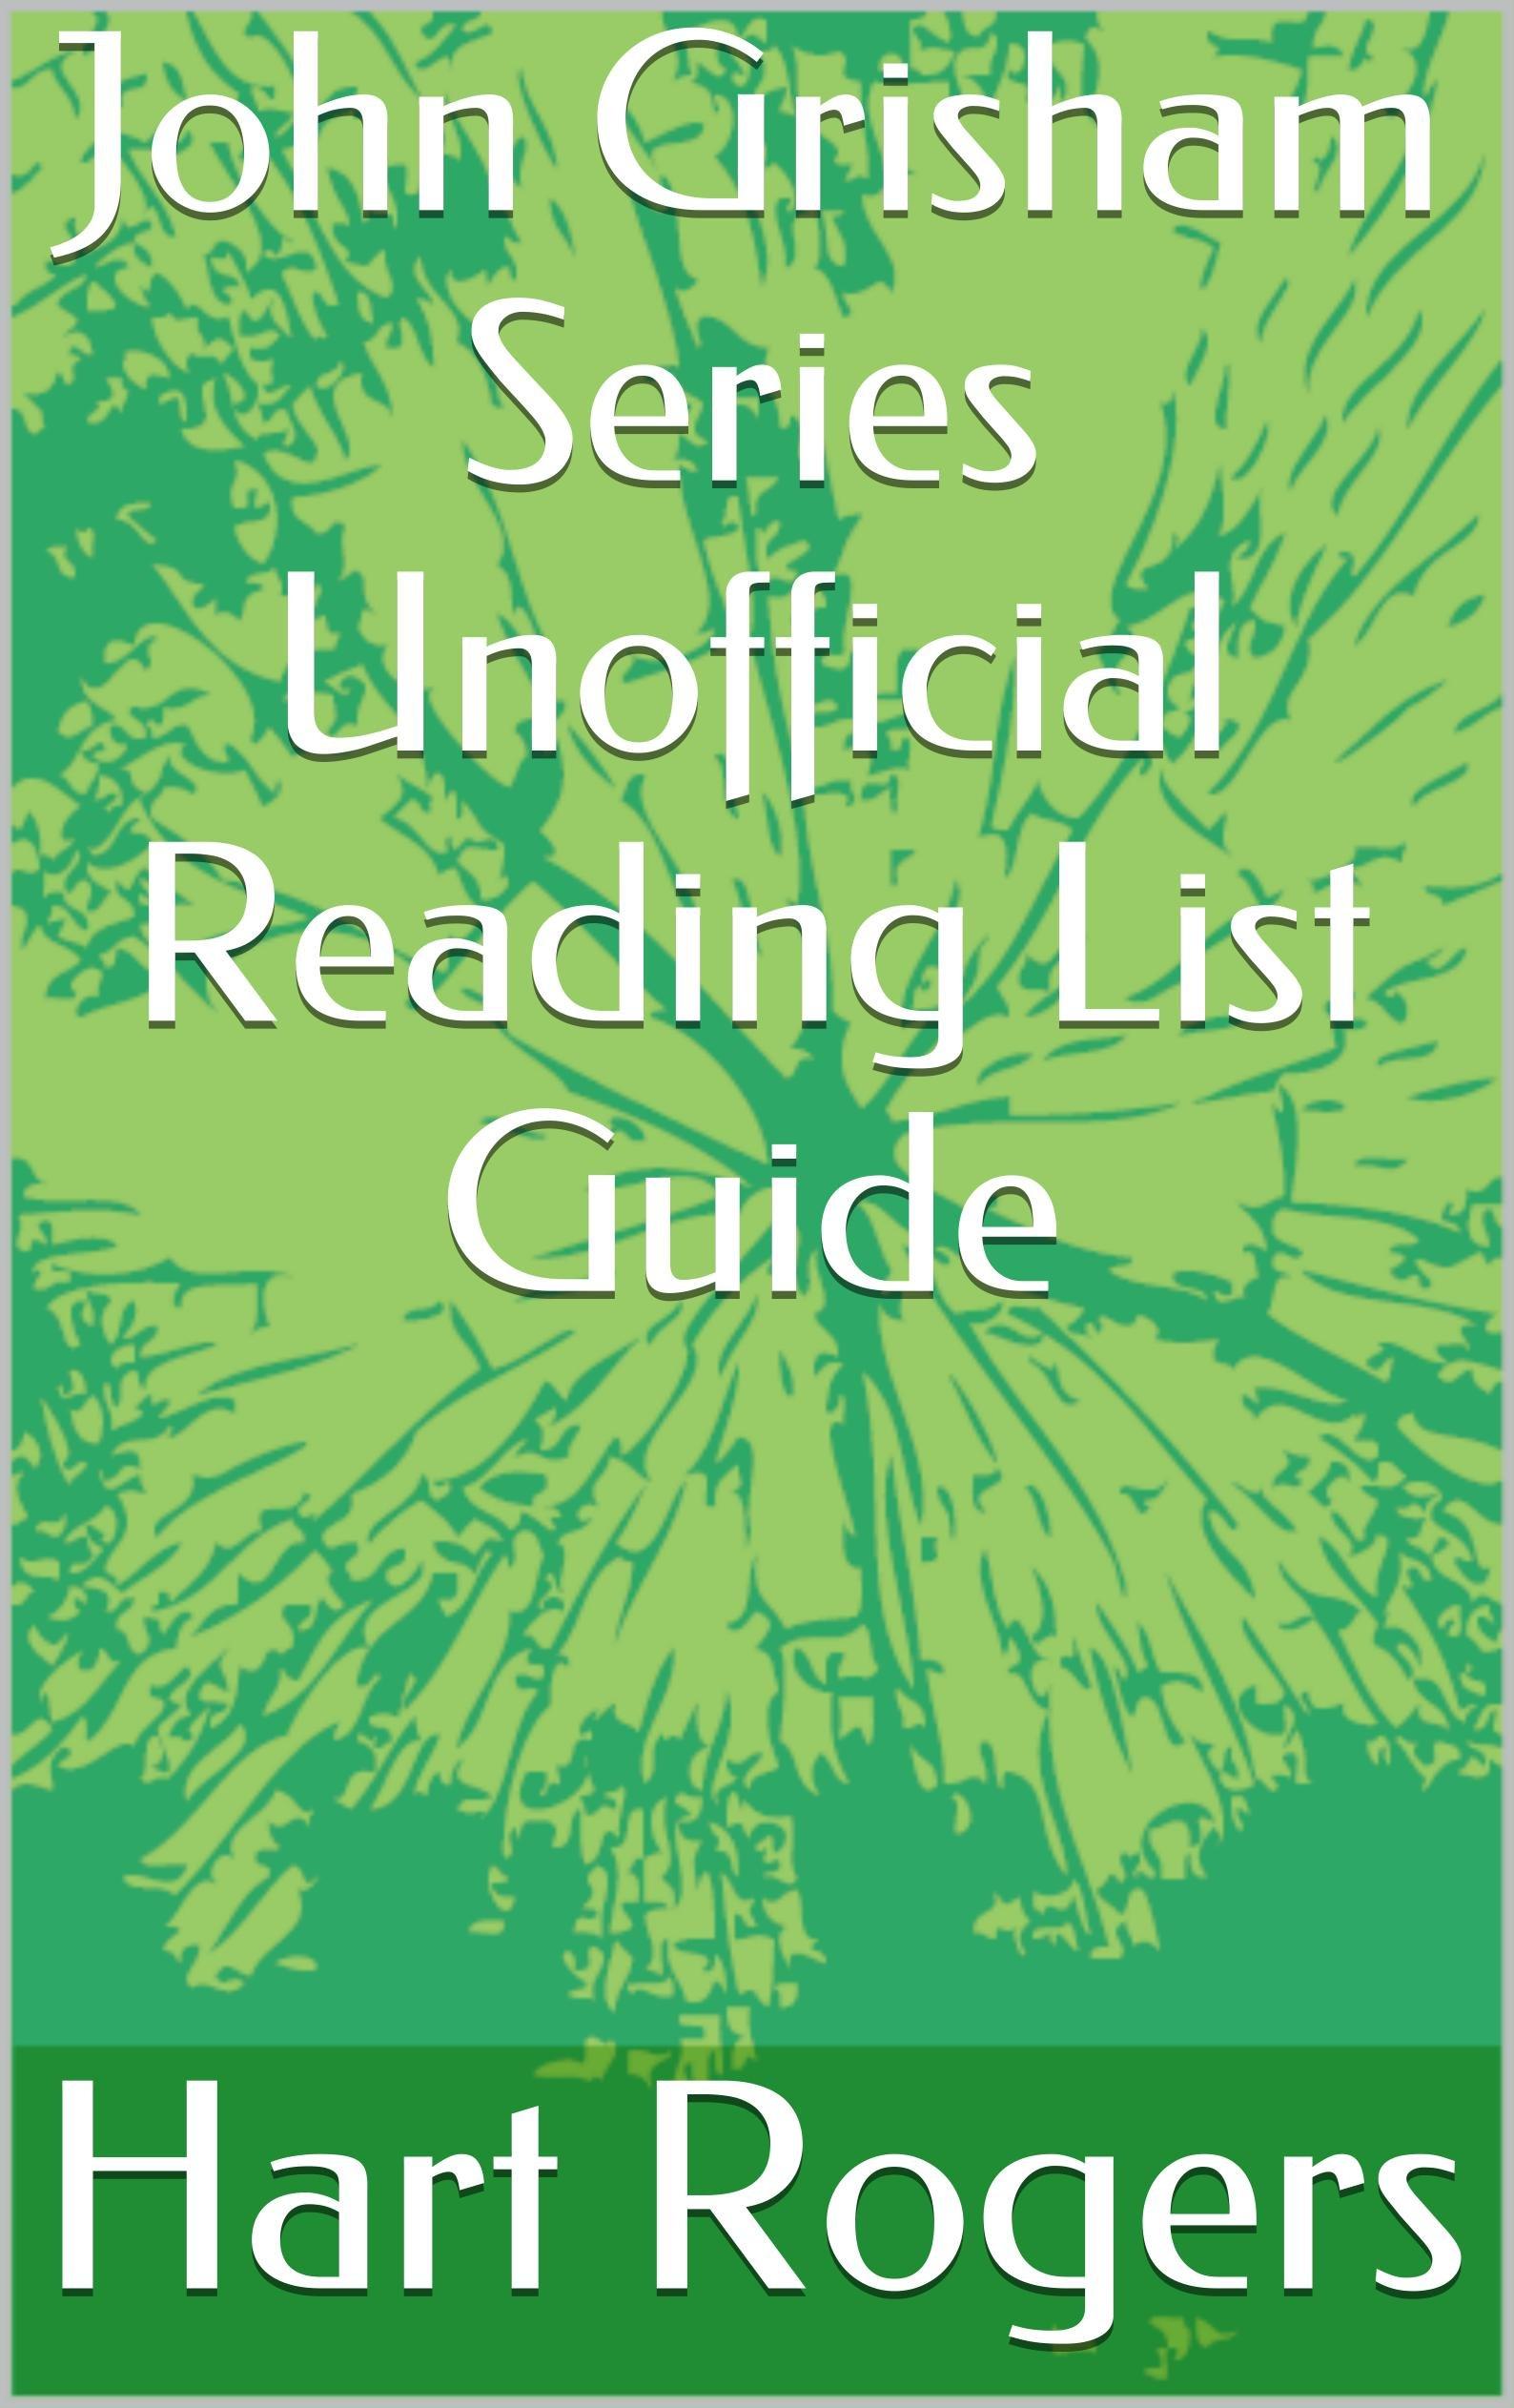 John Grisham Series Unofficial Reading List Guide (Hart Roger's Reading List Guides Book 13)